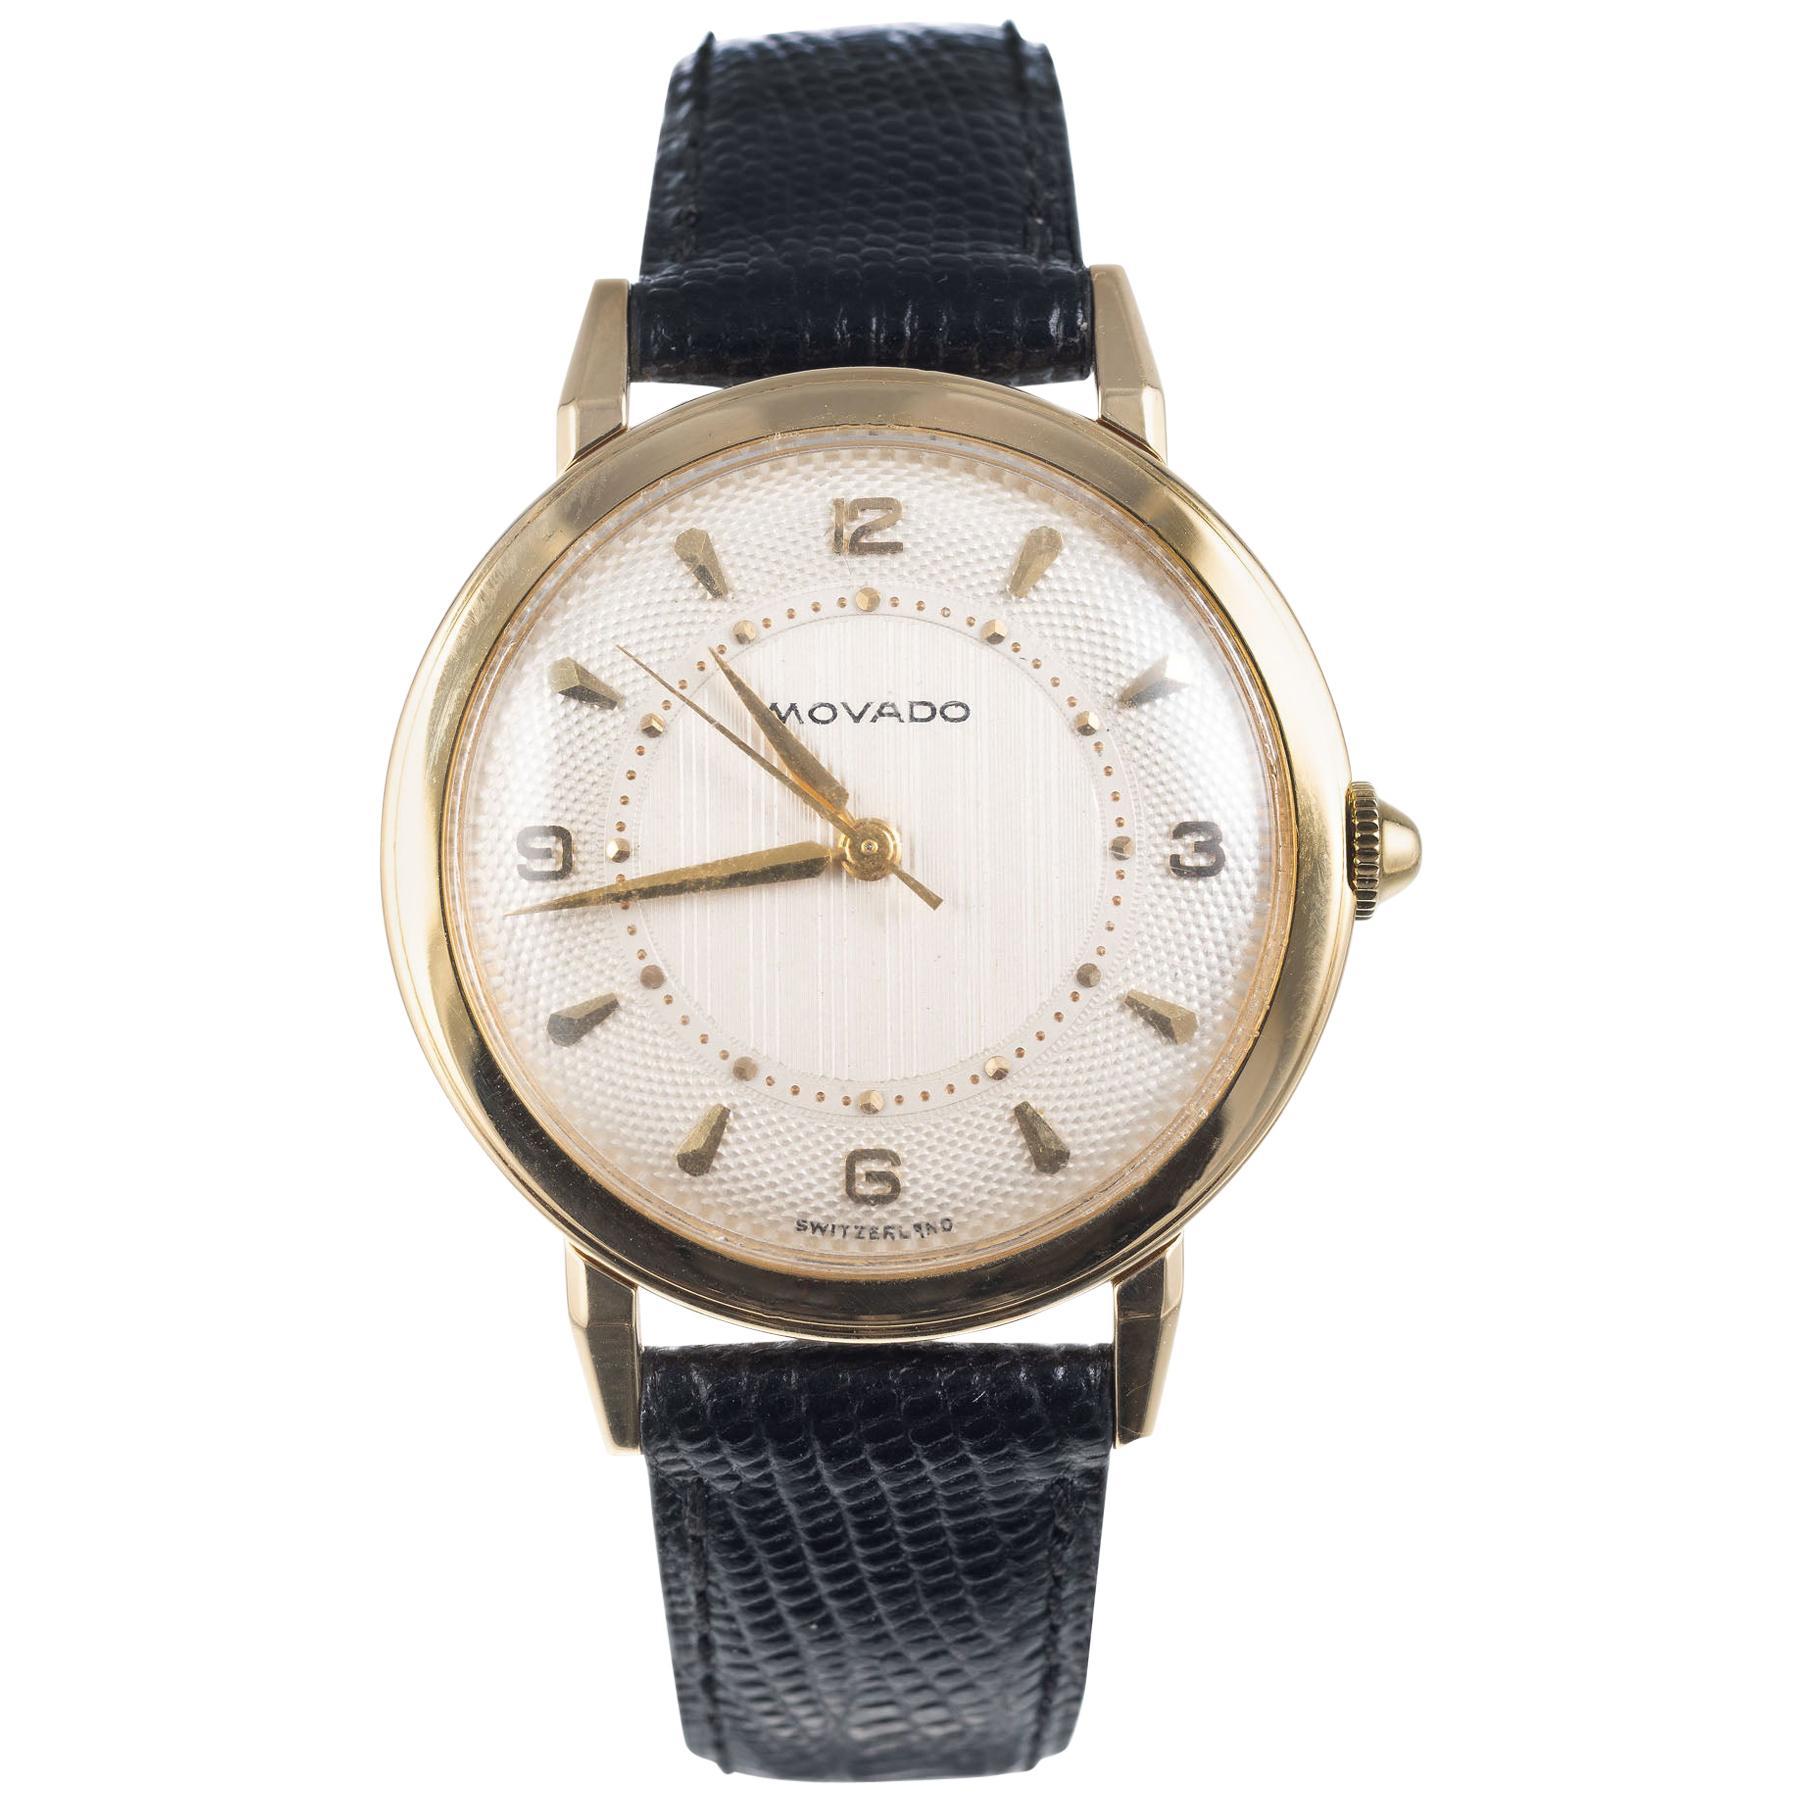 Movado Yellow Gold Manual Wind Men's Strap Wristwatch